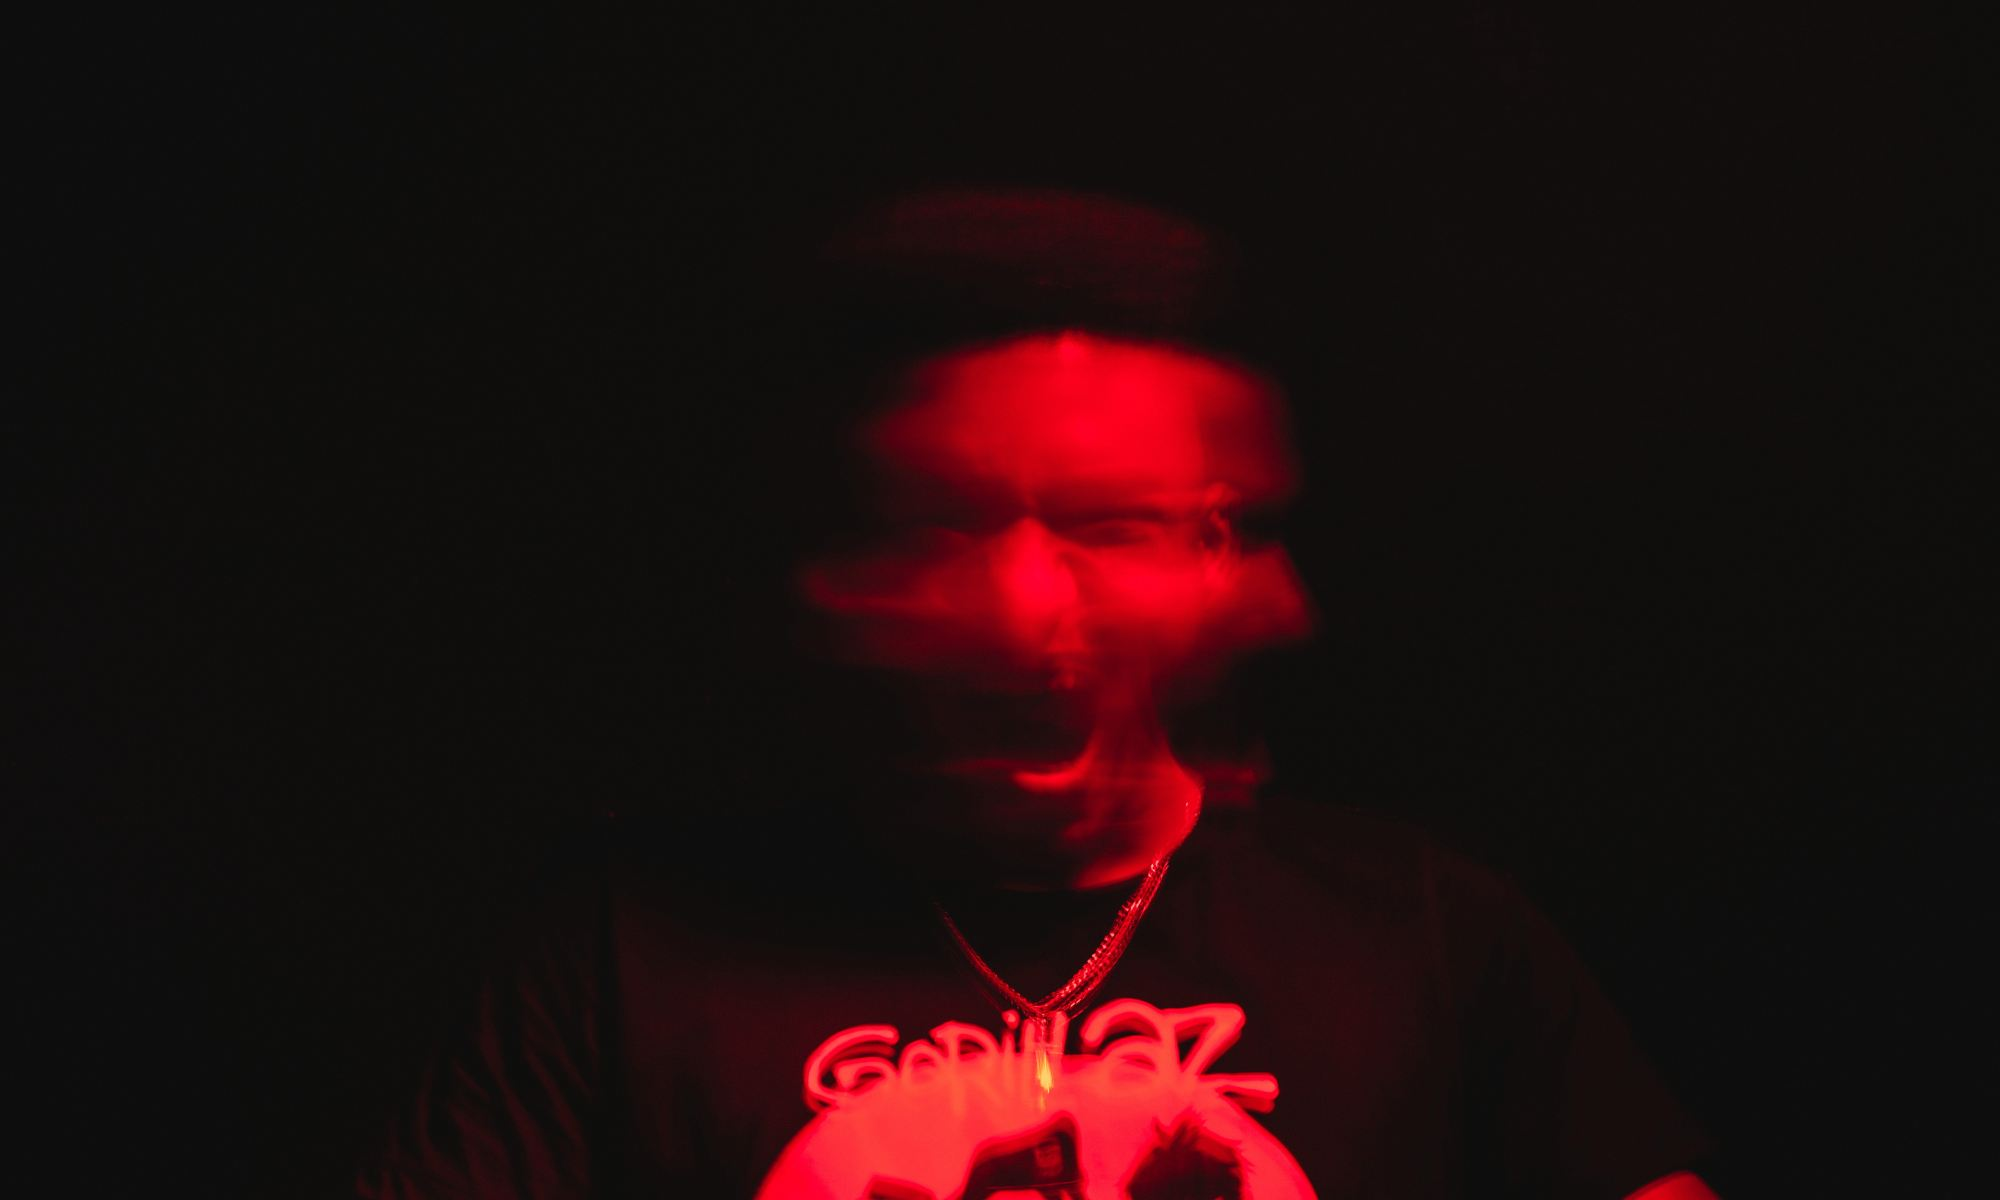 Psychotic patient experiencing disturbing auditory hallucinations